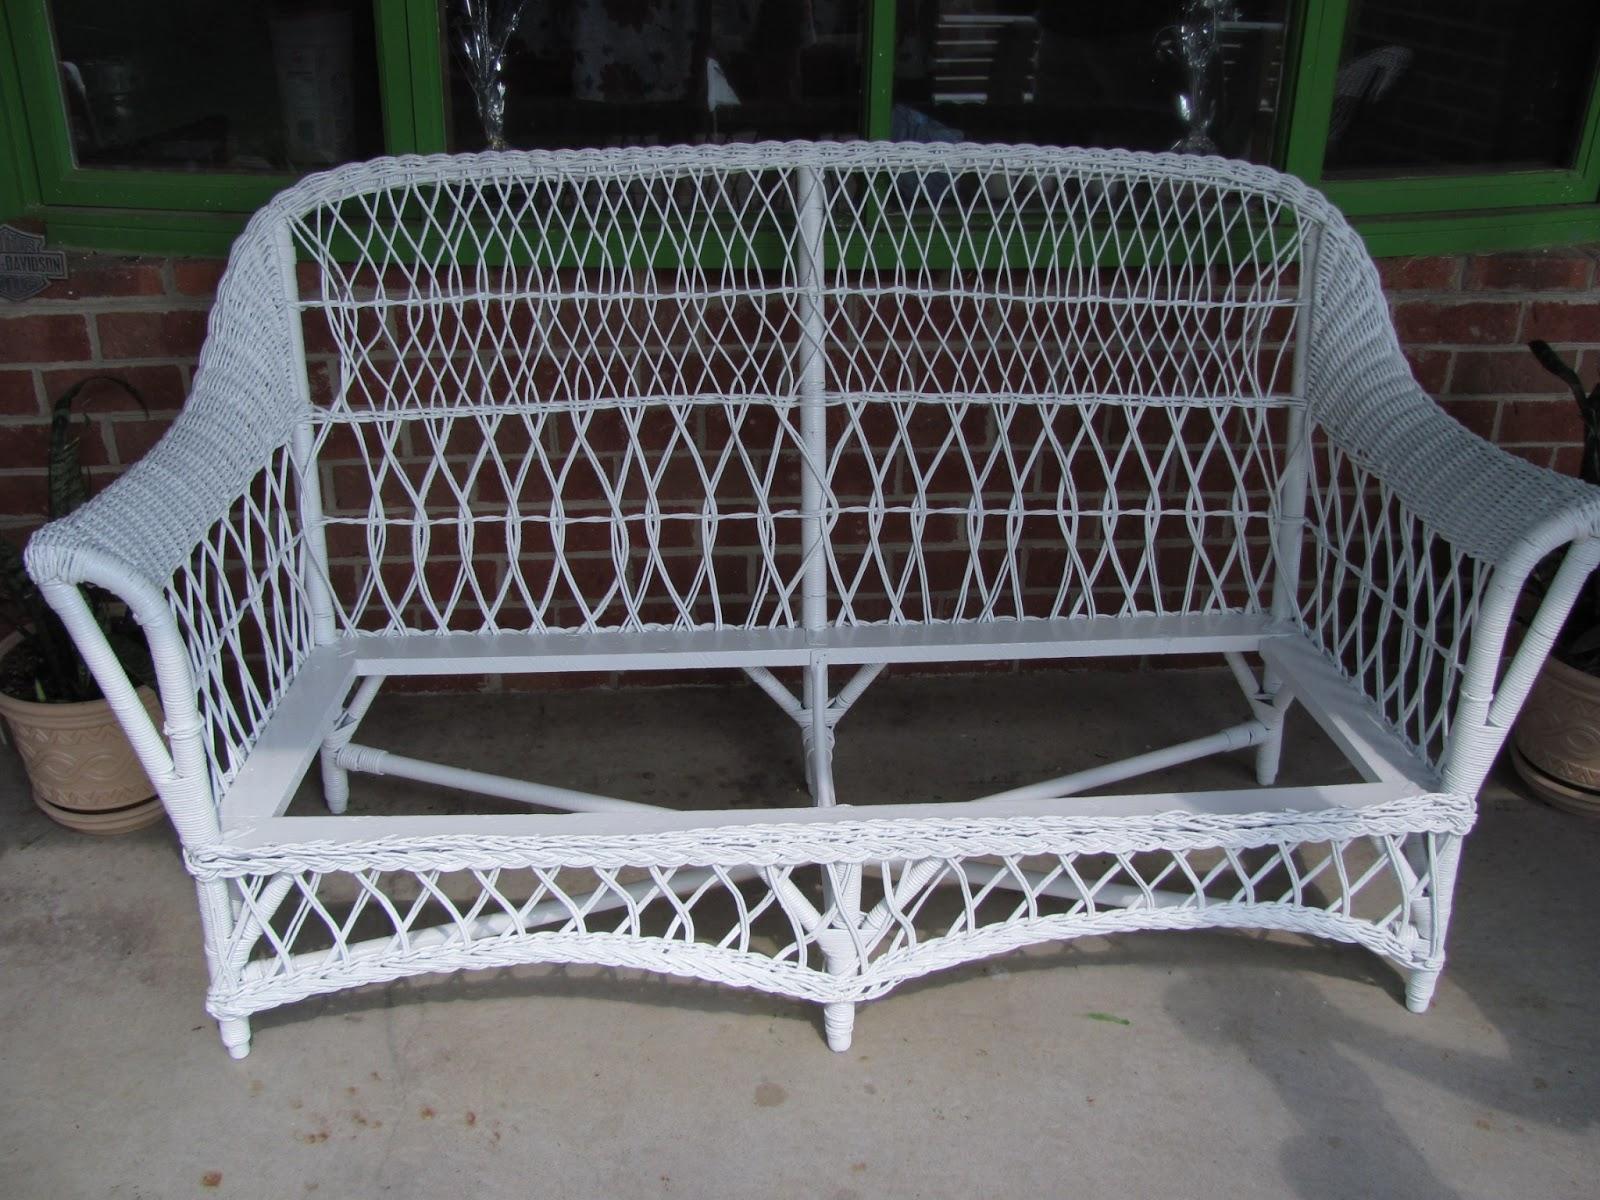 Antique Wicker/Rush Cane Sofa Restoration